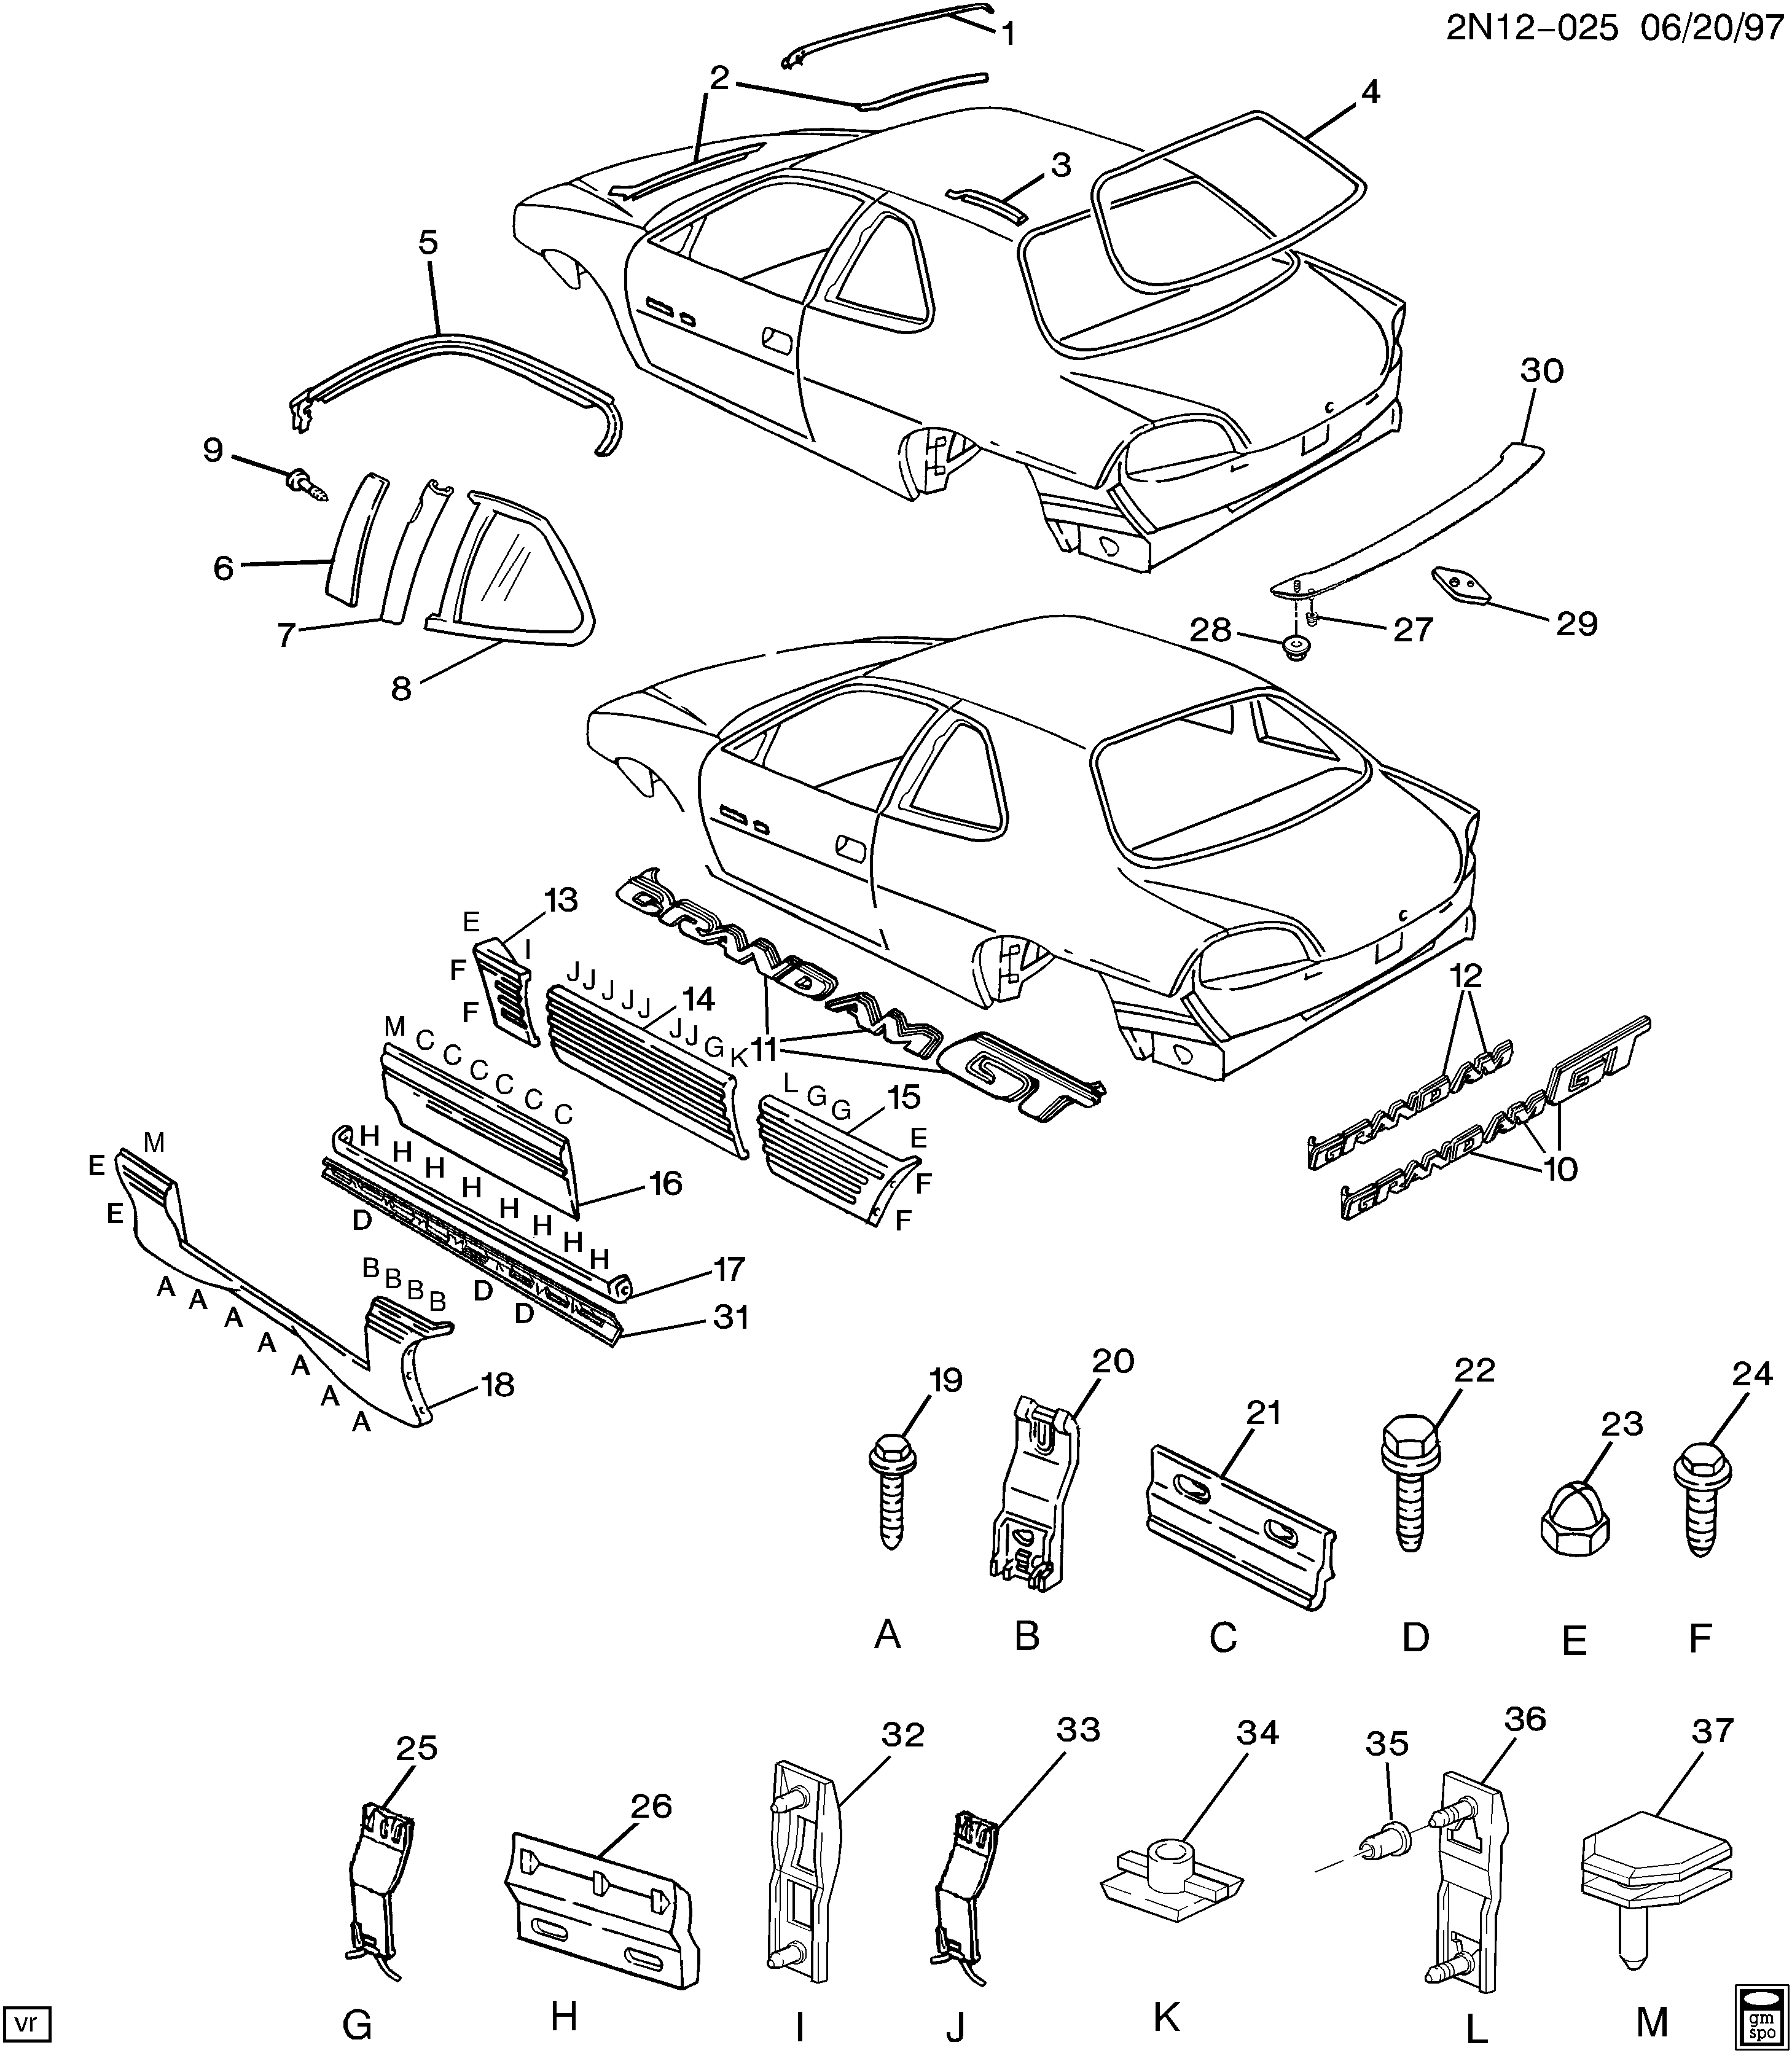 33 pontiac engine diagram 8 - wiring diagram networks  wiring diagram networks - blogger